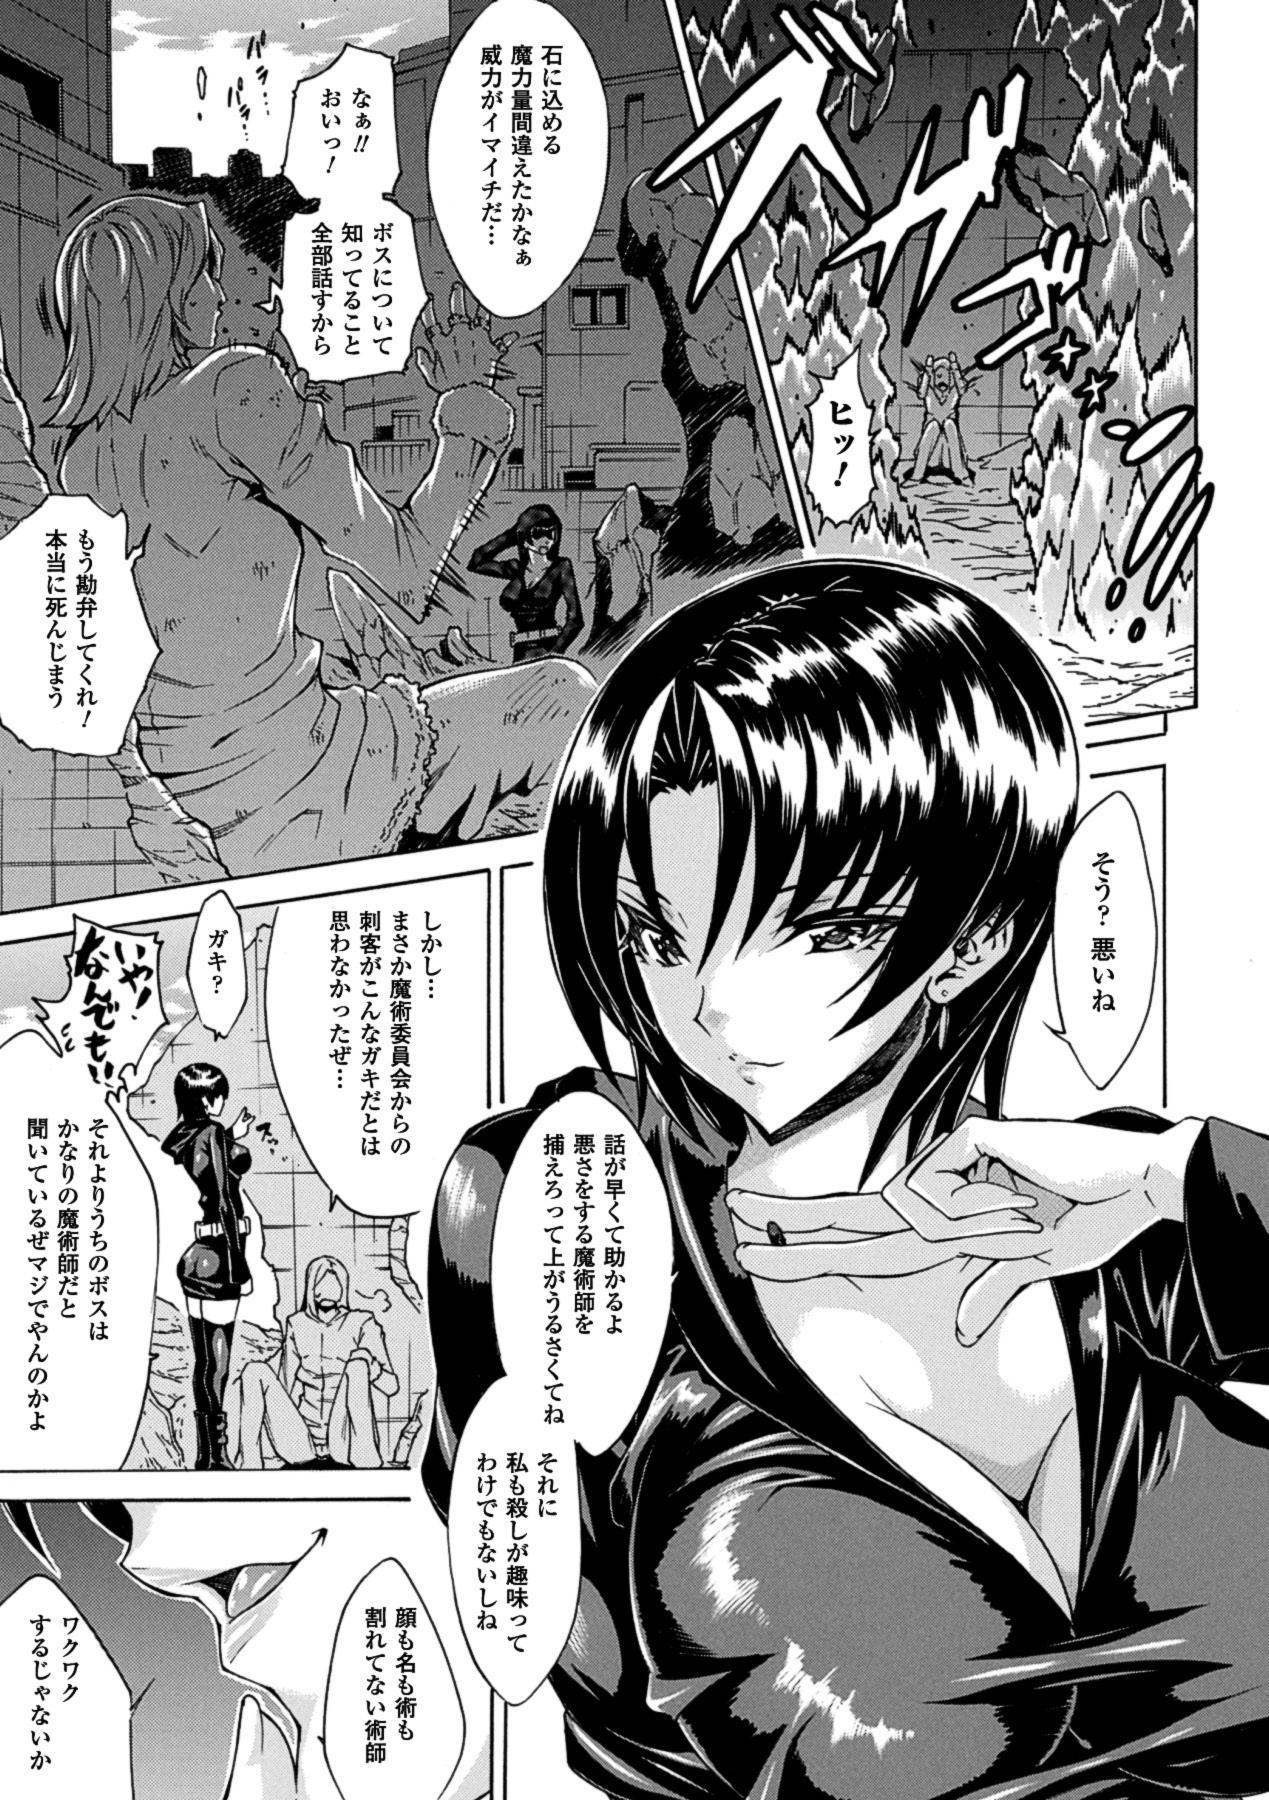 Megami Crisis 10 154